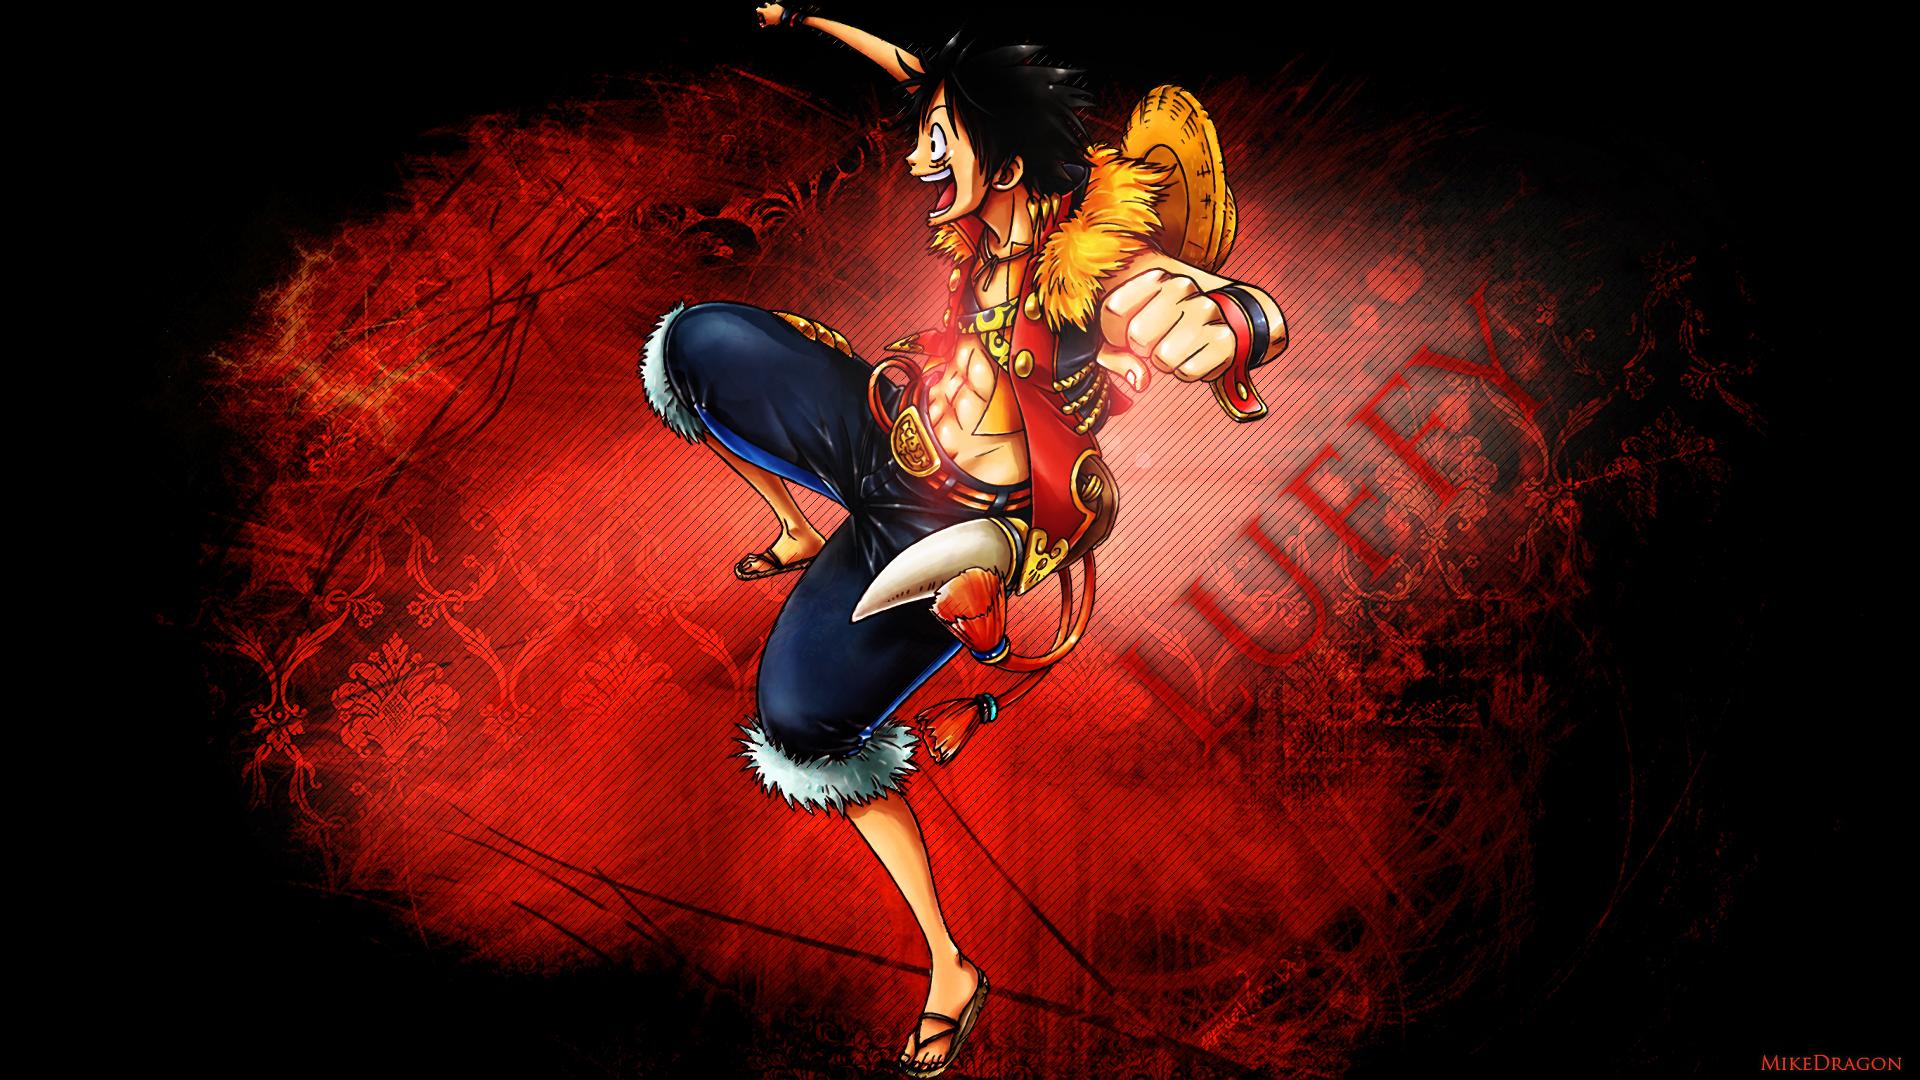 745528 Title Anime One Piece Monkey D Luffy Wallpaper Hd 1920x1080 Download Hd Wallpaper Wallpapertip